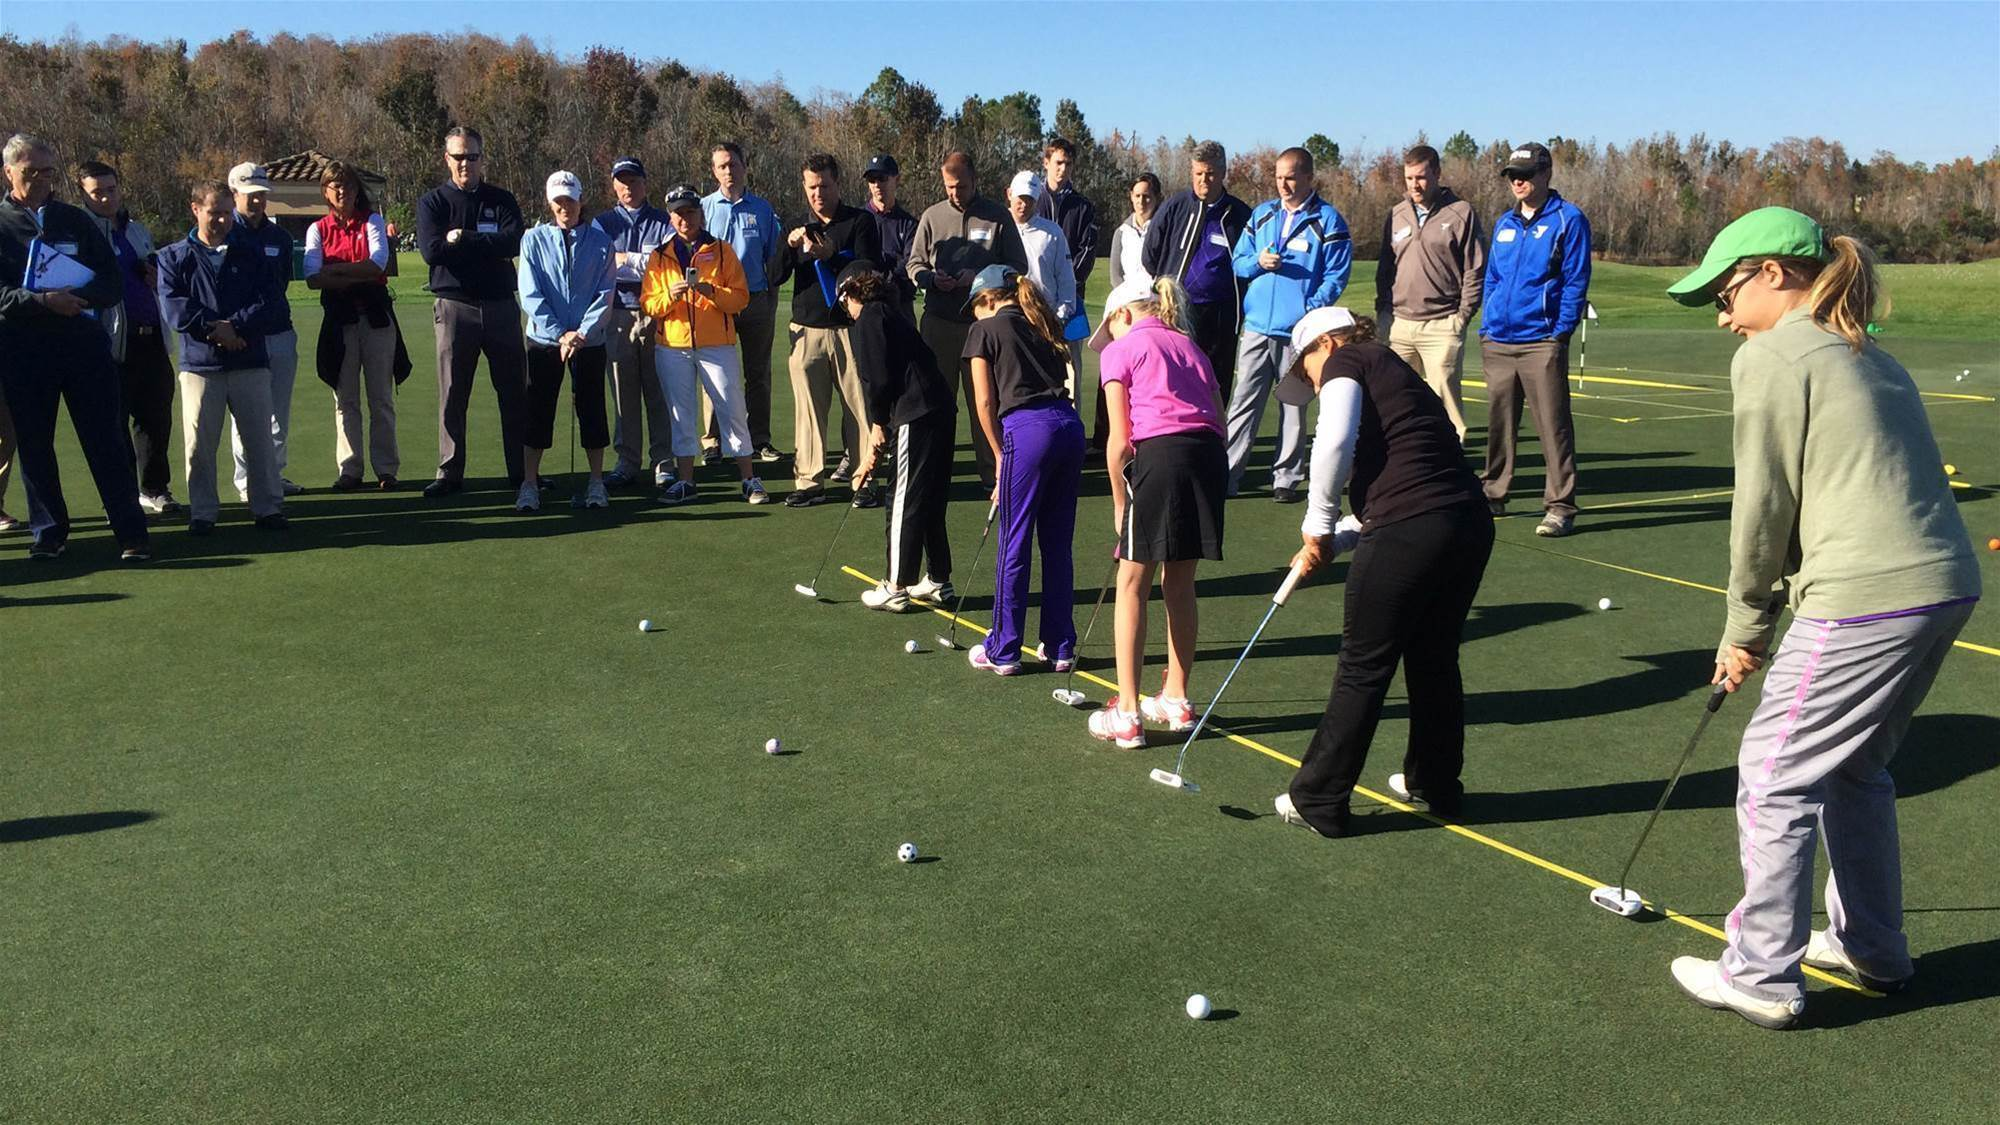 U.S. Kids Golf offering first ever Australian coaching certification